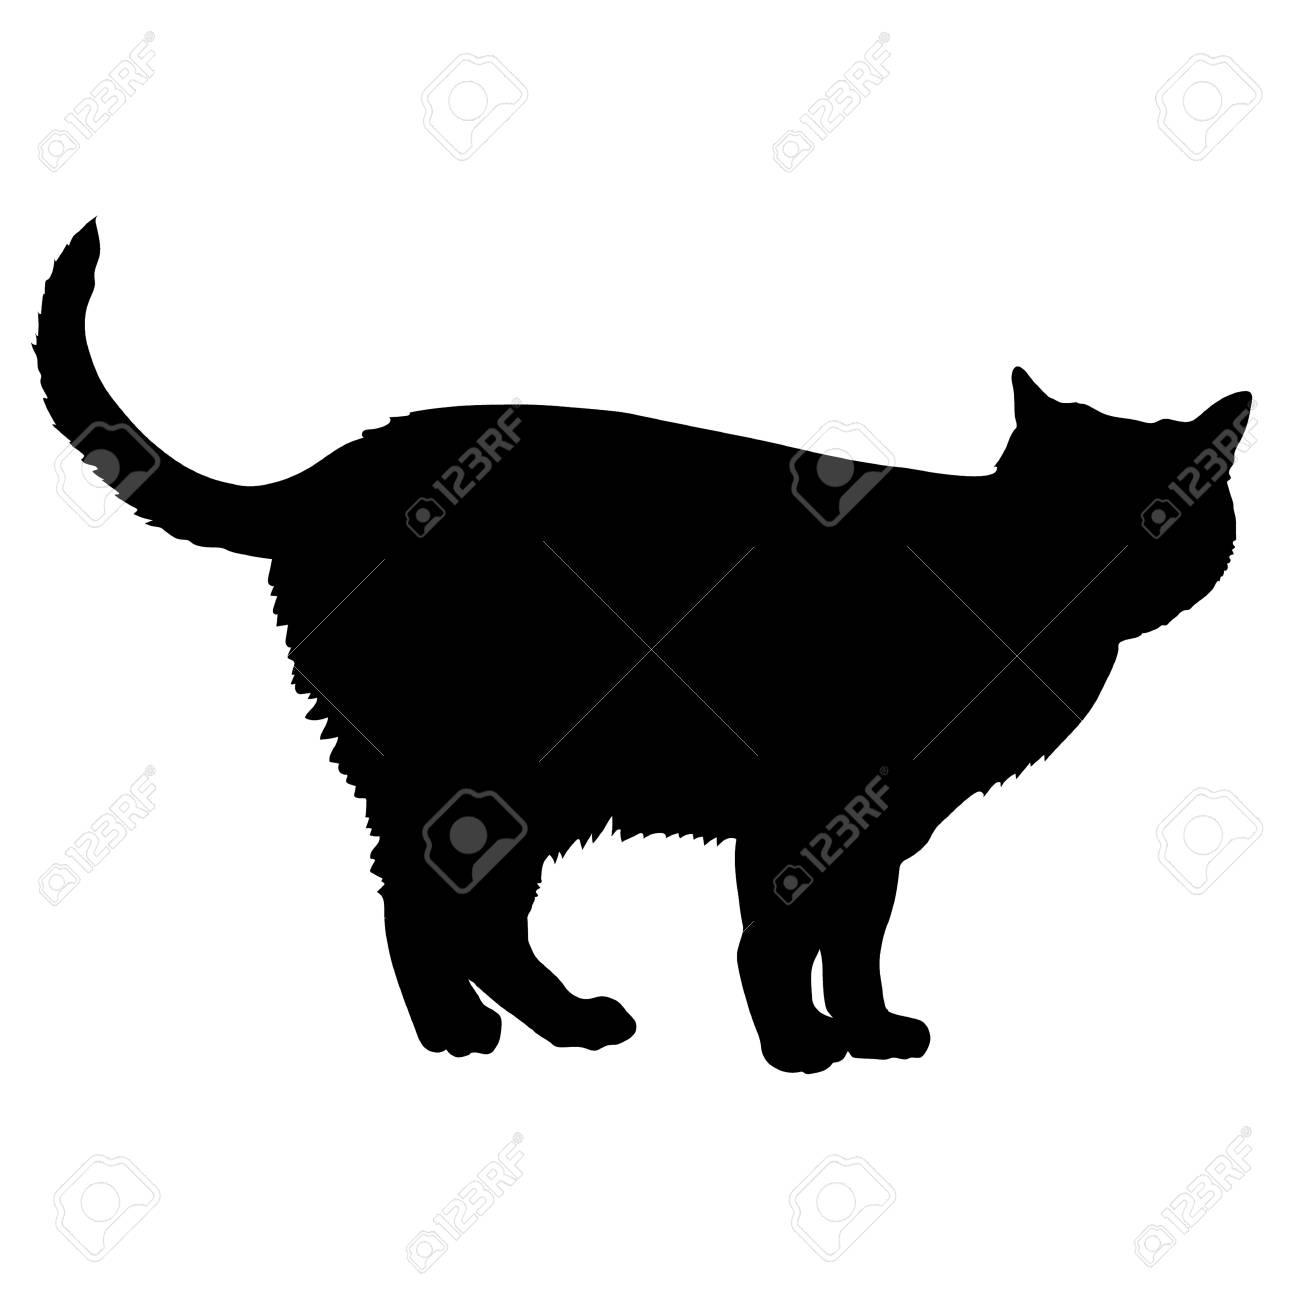 A black silhouette of a cat - 41855412